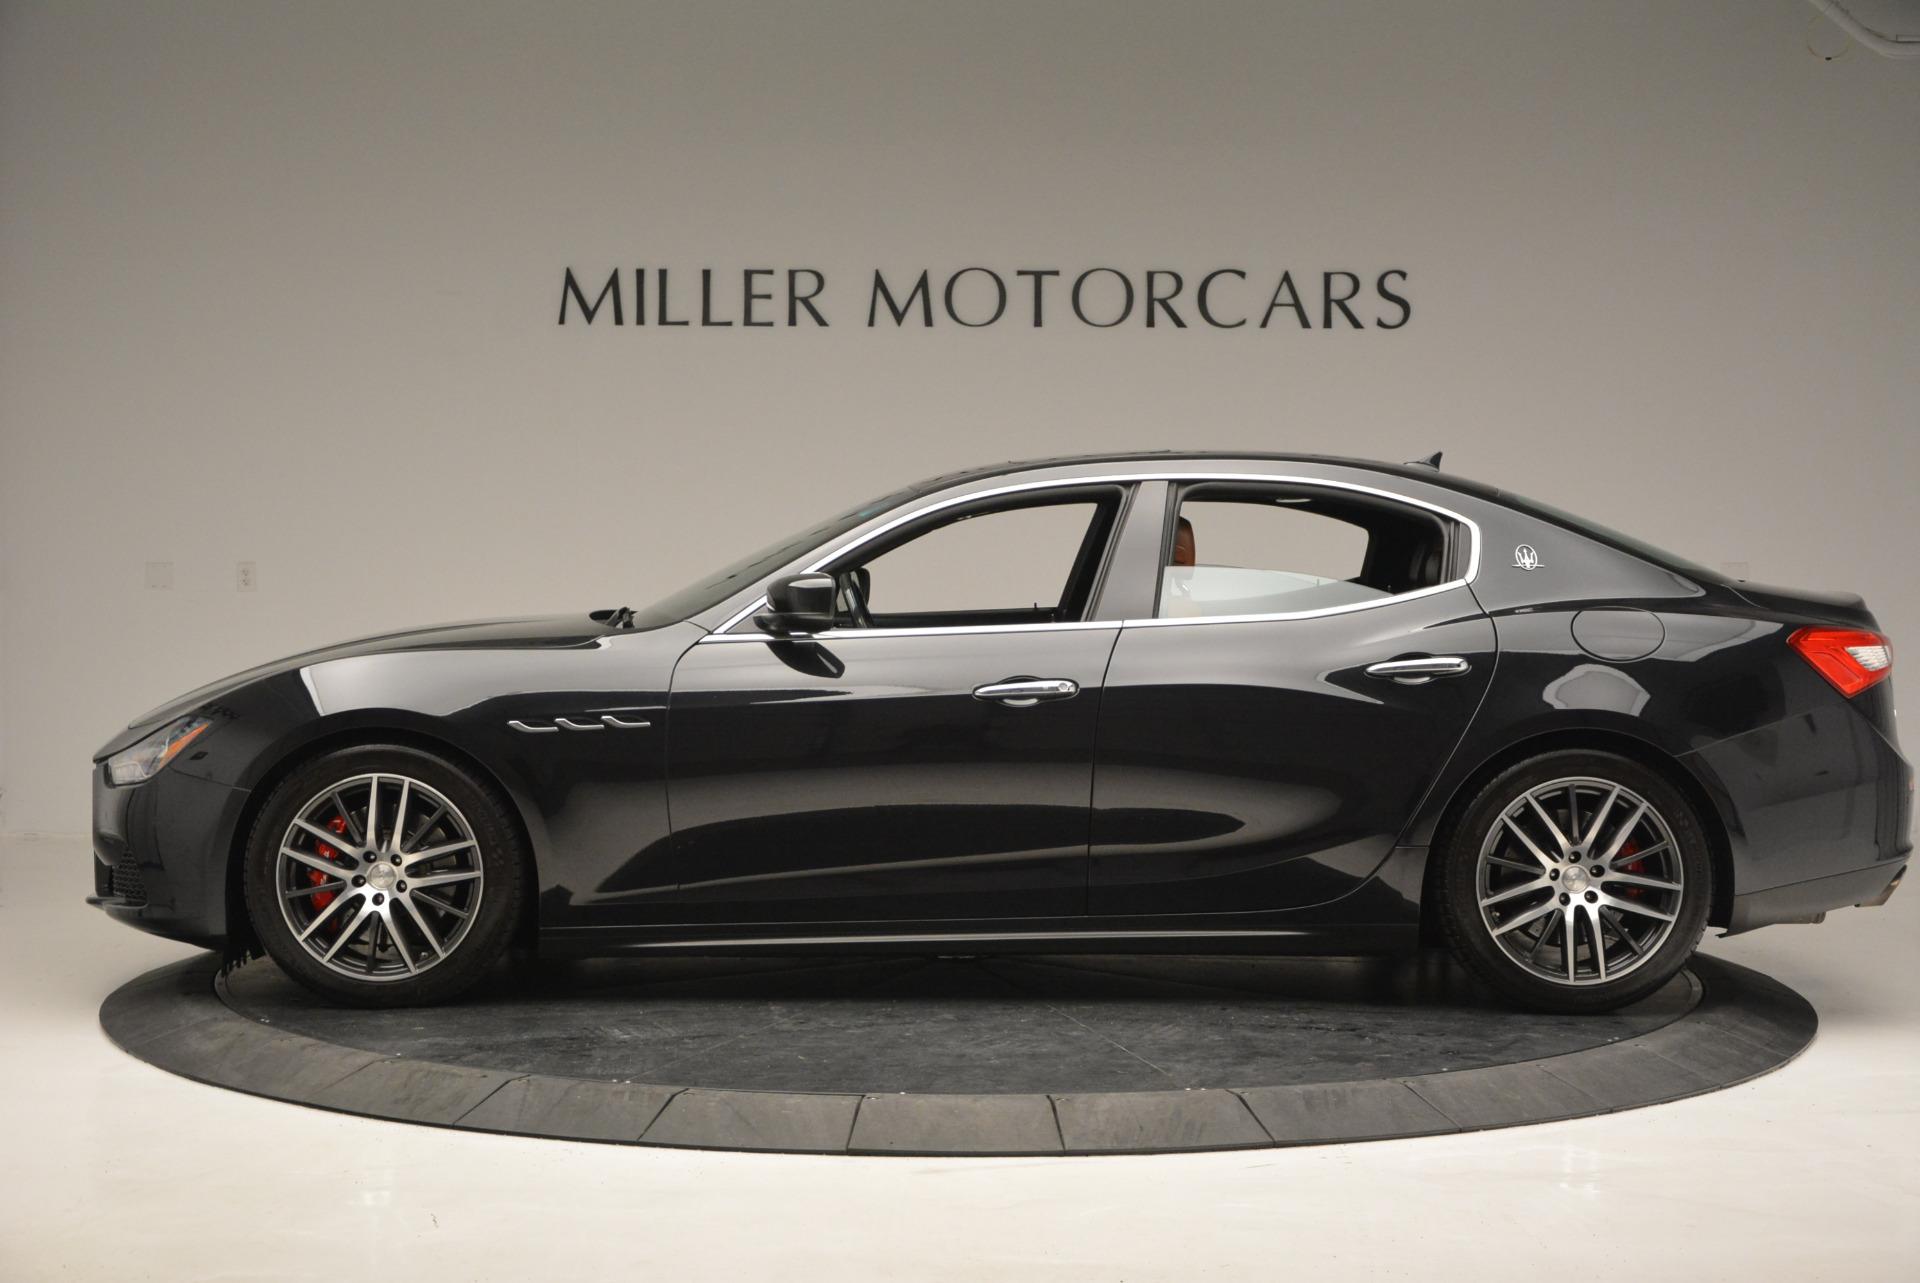 Used 2014 Maserati Ghibli S Q4 For Sale In Greenwich, CT 805_p3